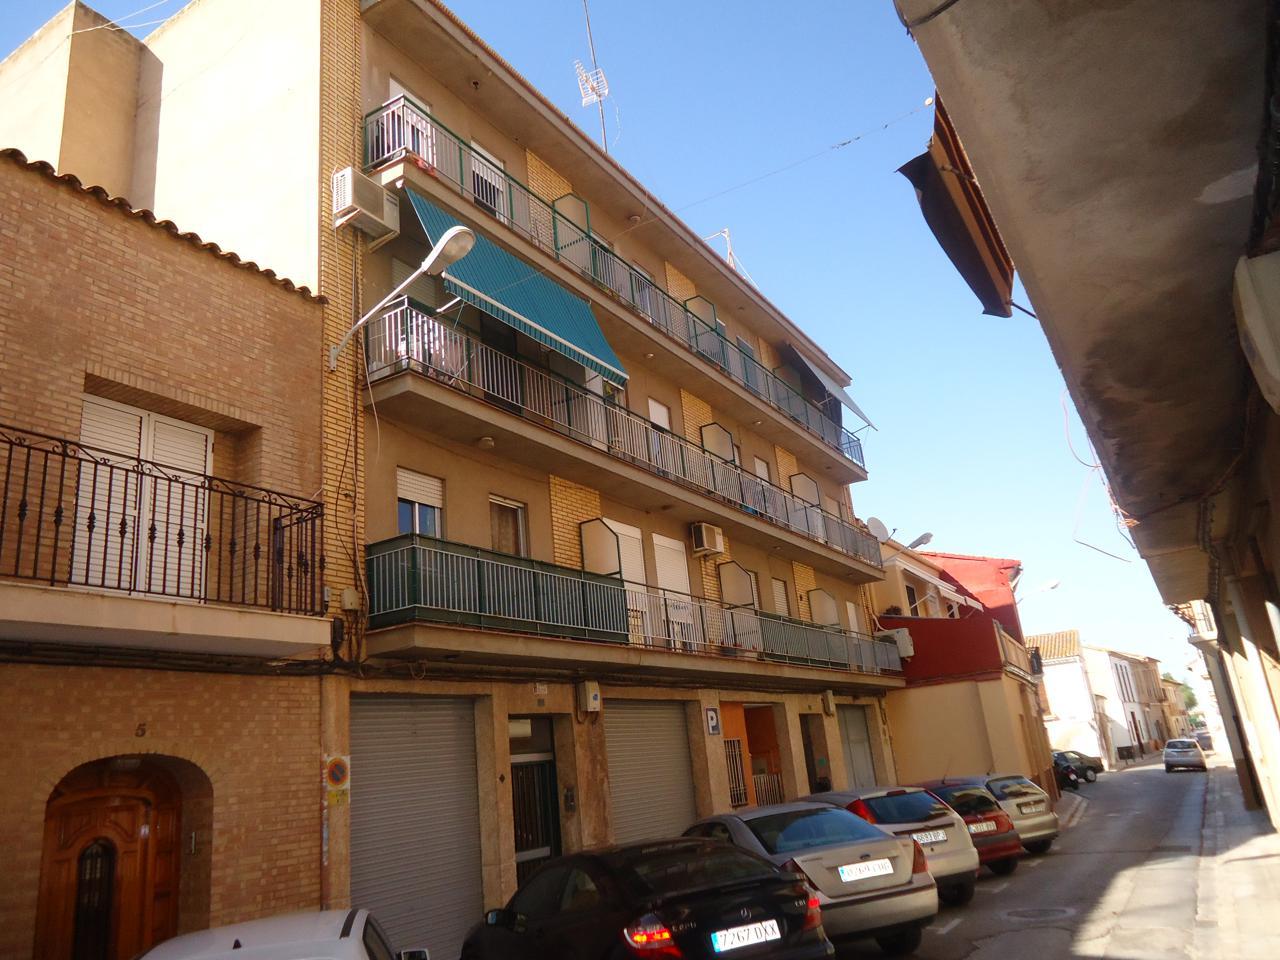 Rent Flat  Calle carrer esglesia. Este piso reformado se encuentra en carrer esglesia, 46134, foio